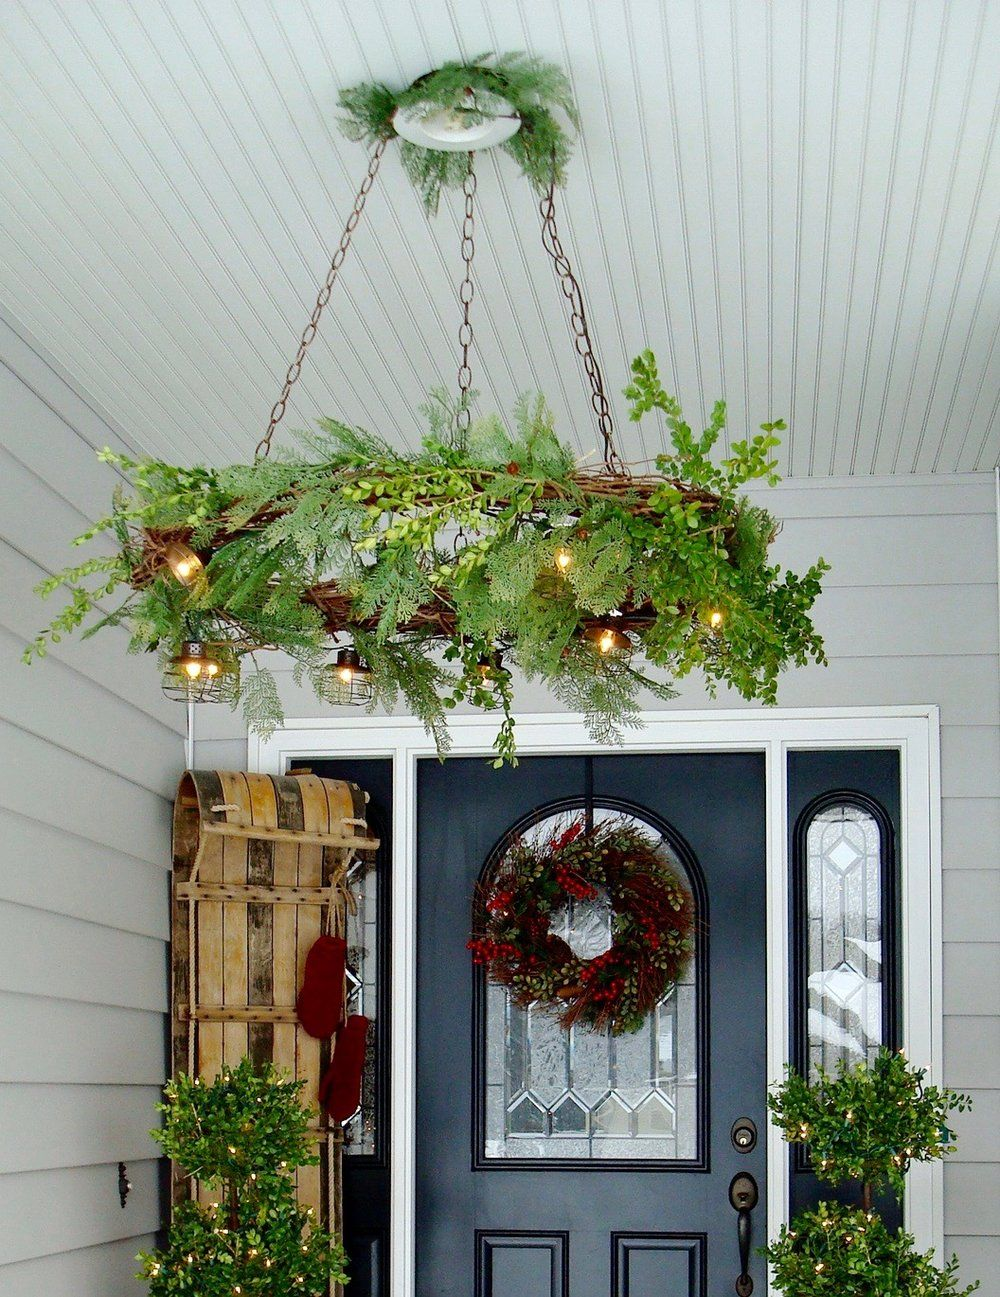 Grapevine Wreath Chandelier Urban Cottage Living Front Porch Christmas Decor Christmas Centerpieces Christmas Home